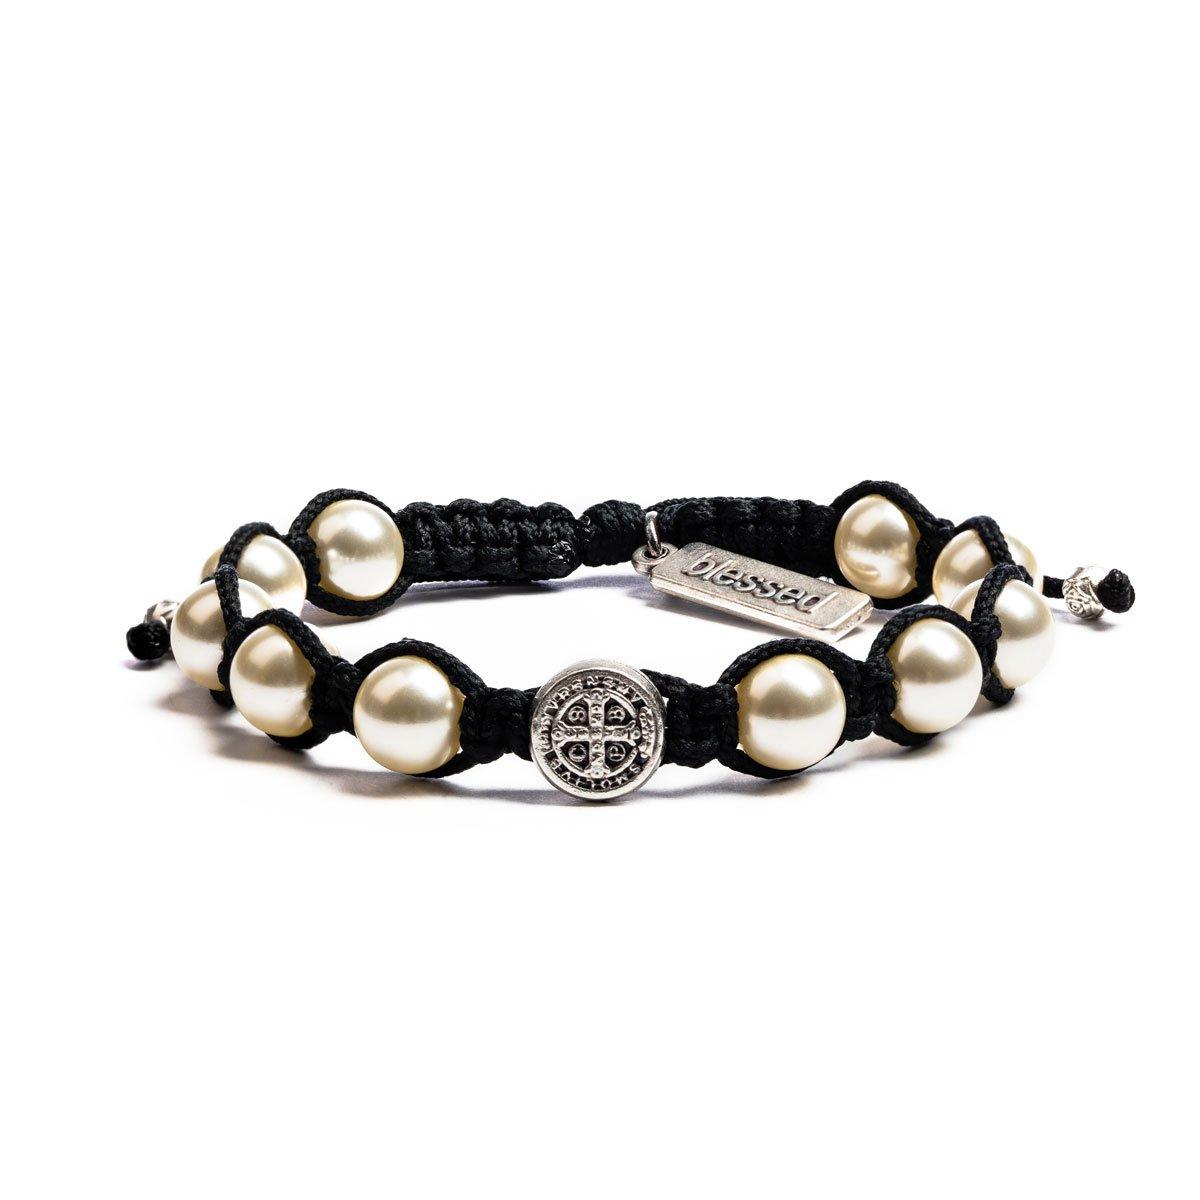 My Saint My Hero Divine Blessing Bracelet - White Pearl, Silver Medal, Black Cording by My Saint My Hero